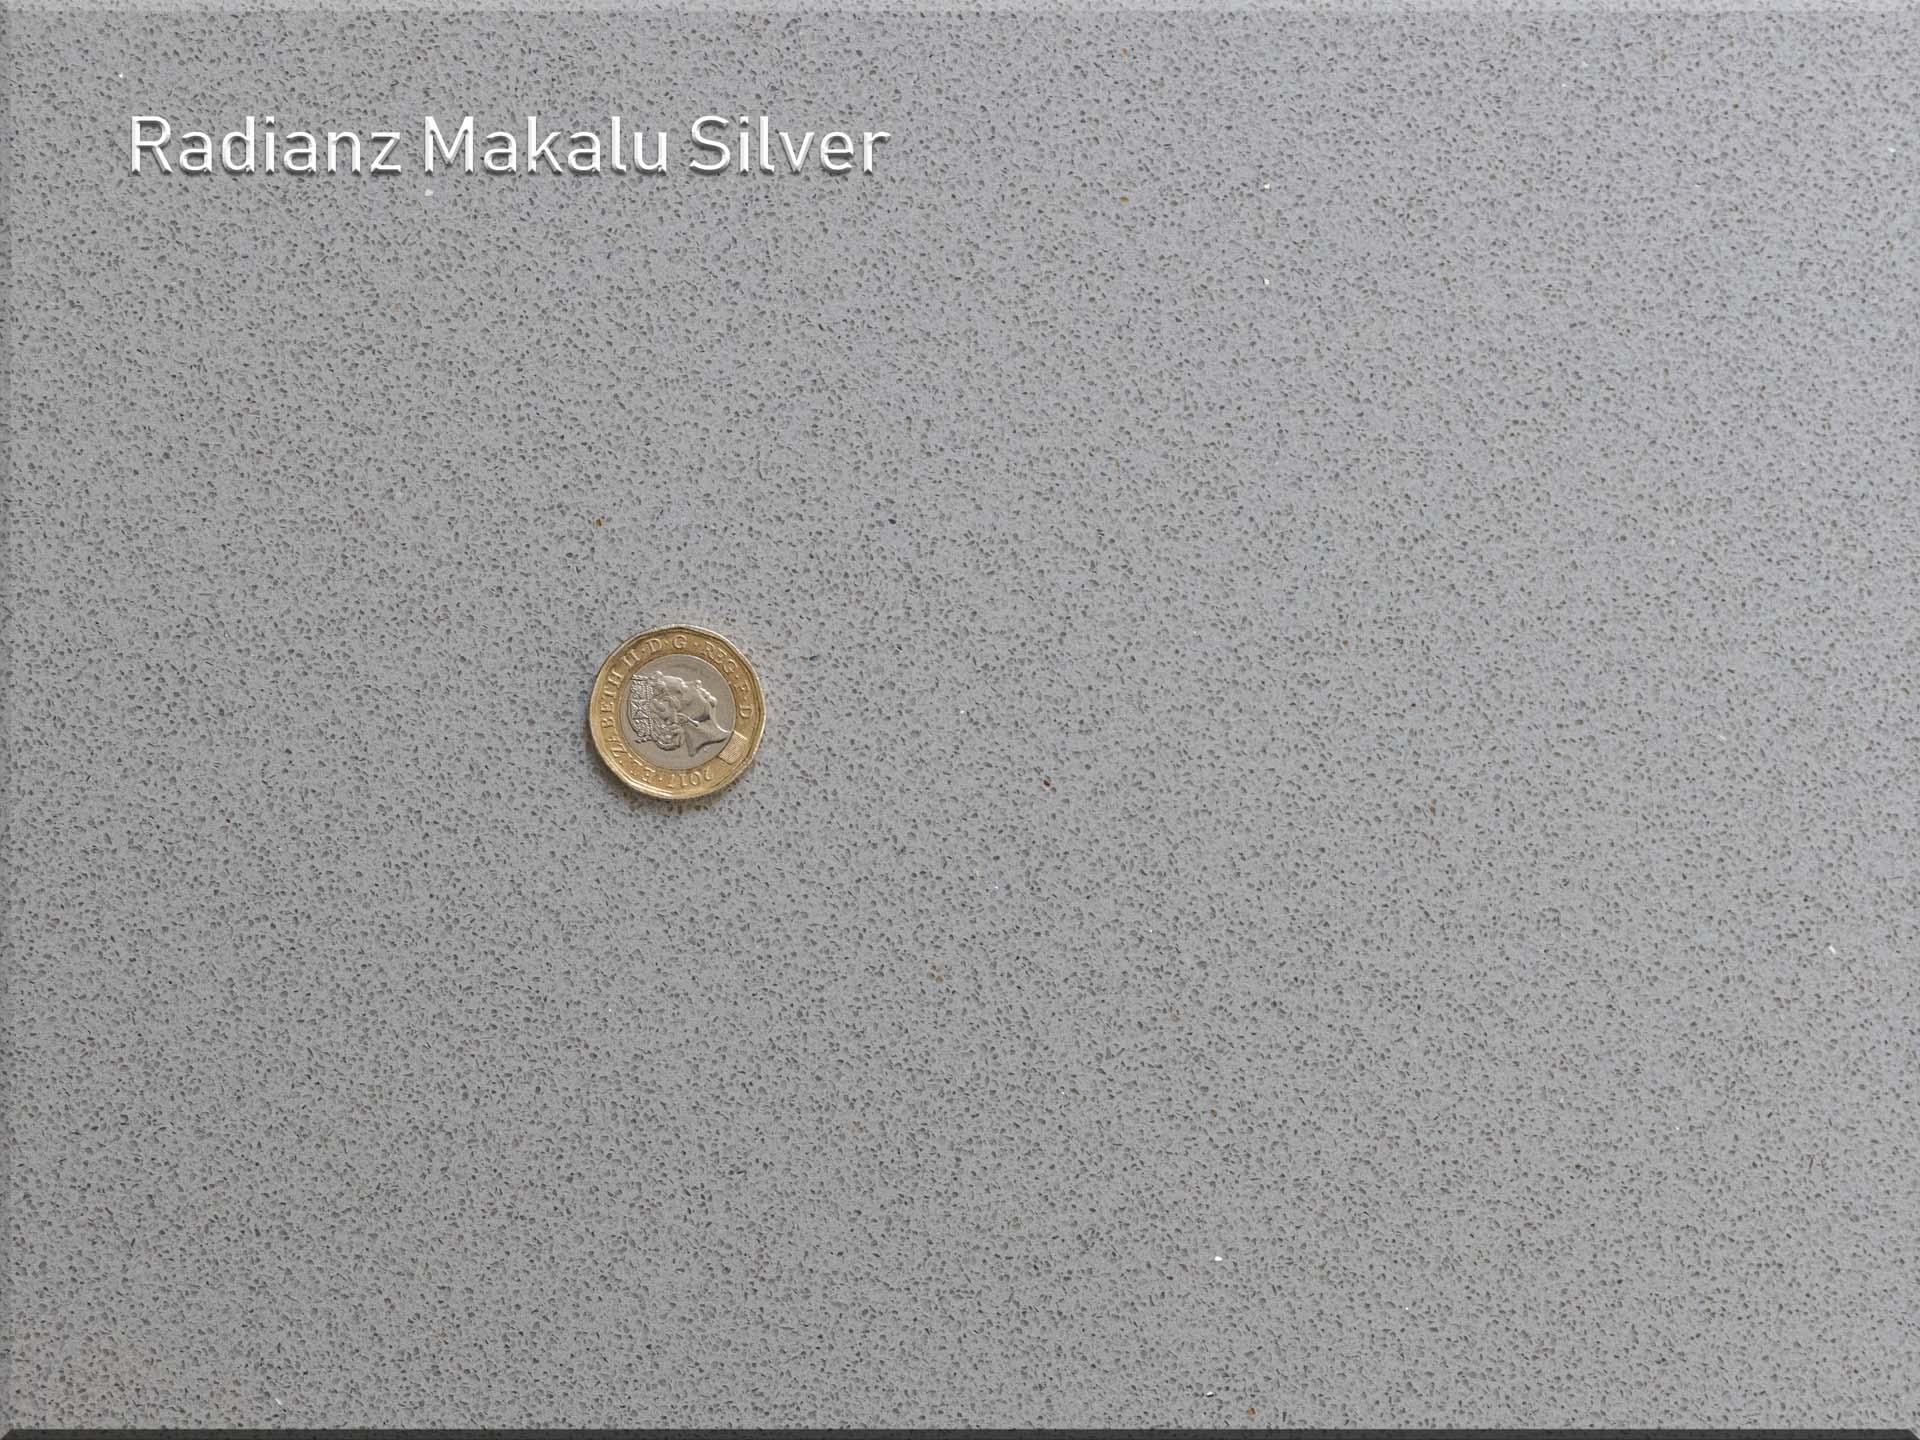 radianz makalu silver small sparkly quartz worktops subtle special offer july 2019 164053